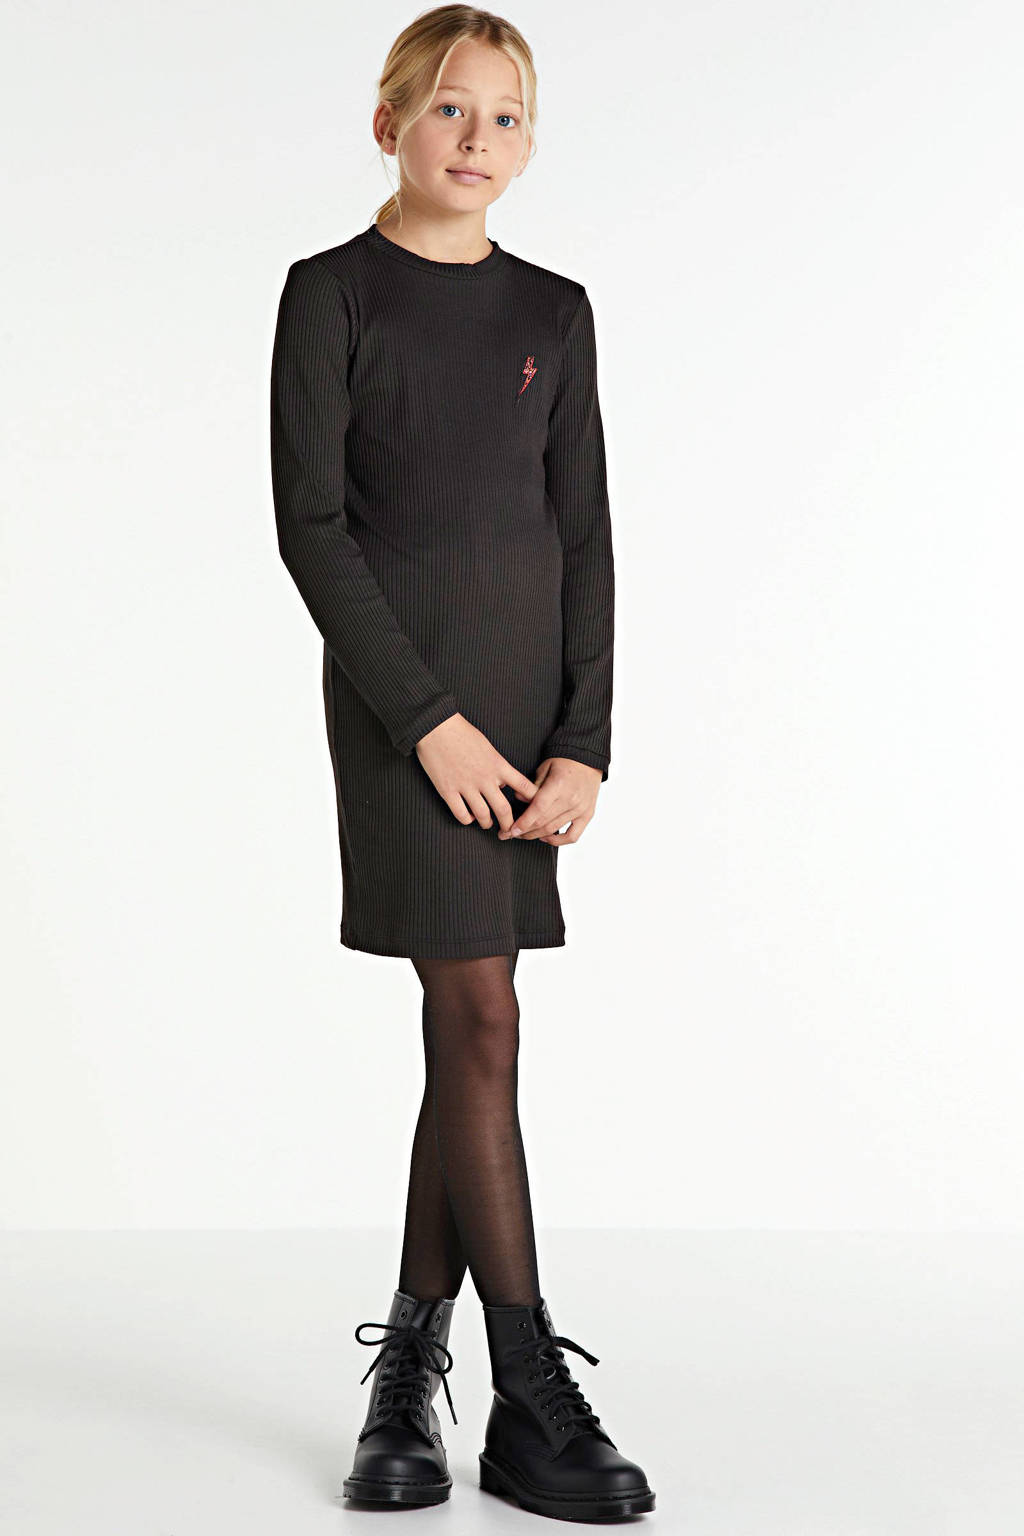 Zigga ribgebreide jurk met borduursels zwart, Zwart